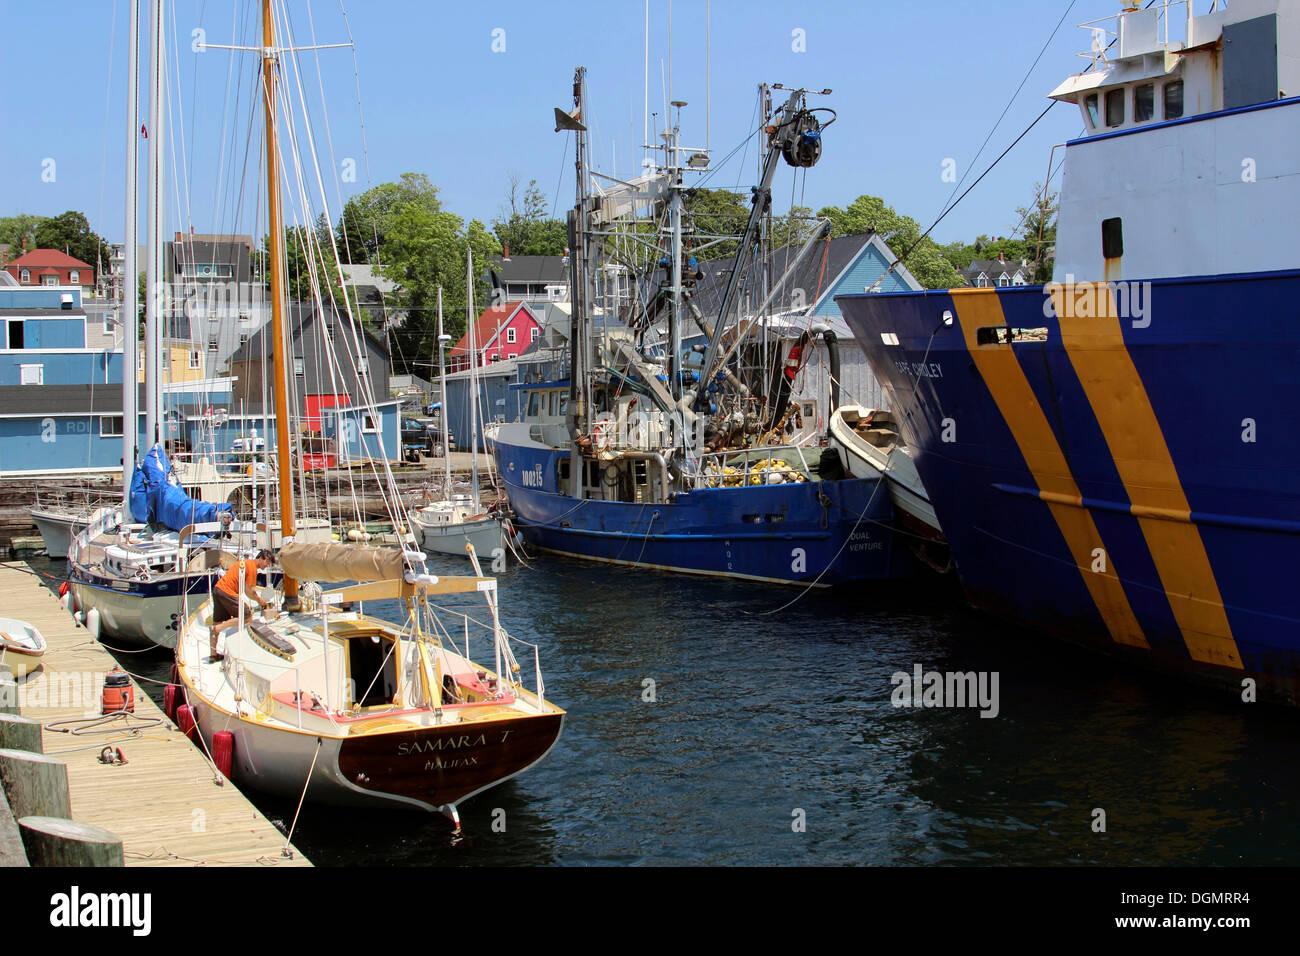 Port, Lunenburg, Eastern Shore, Maritime Provinces, Nova Scotia, Canada - Stock Image